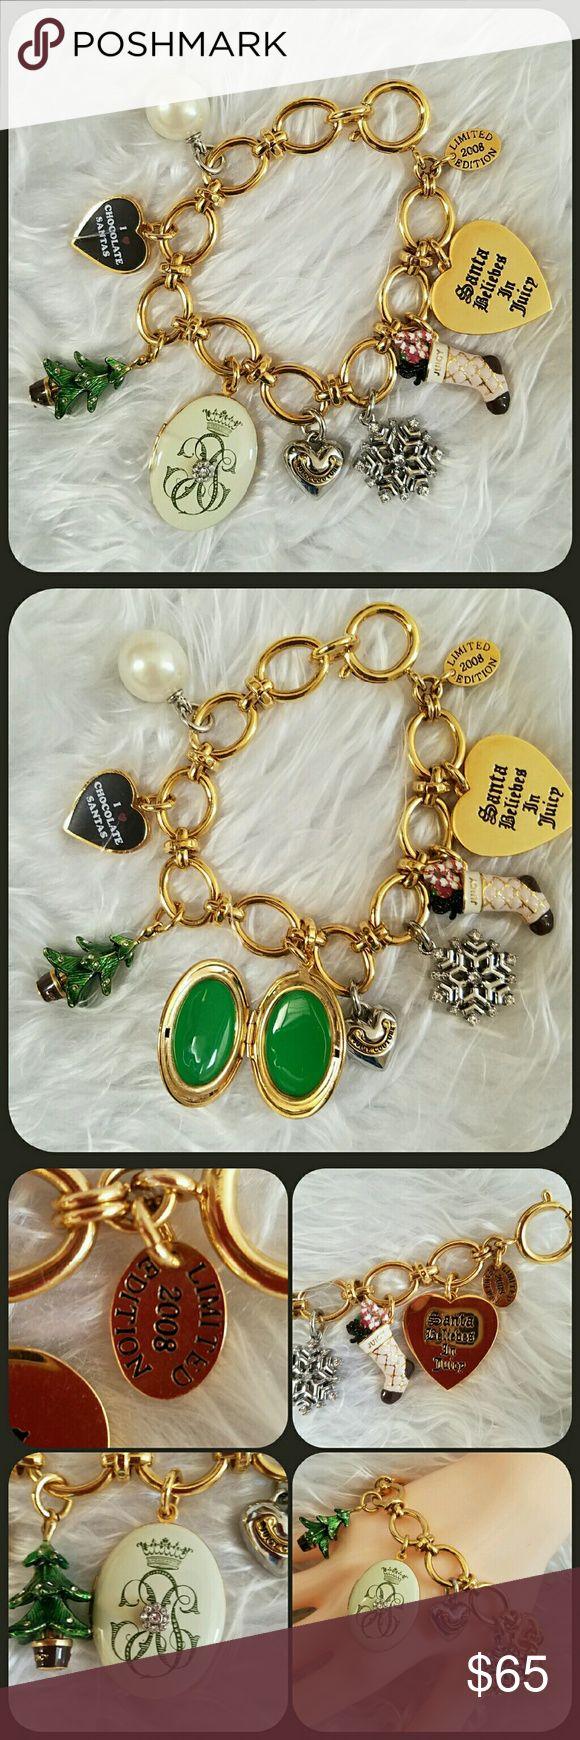 Juicy Couture Limited Edition Charm Bracelet Authentic Limited Edition Charm  Bracelet By Juicy Couture 2008